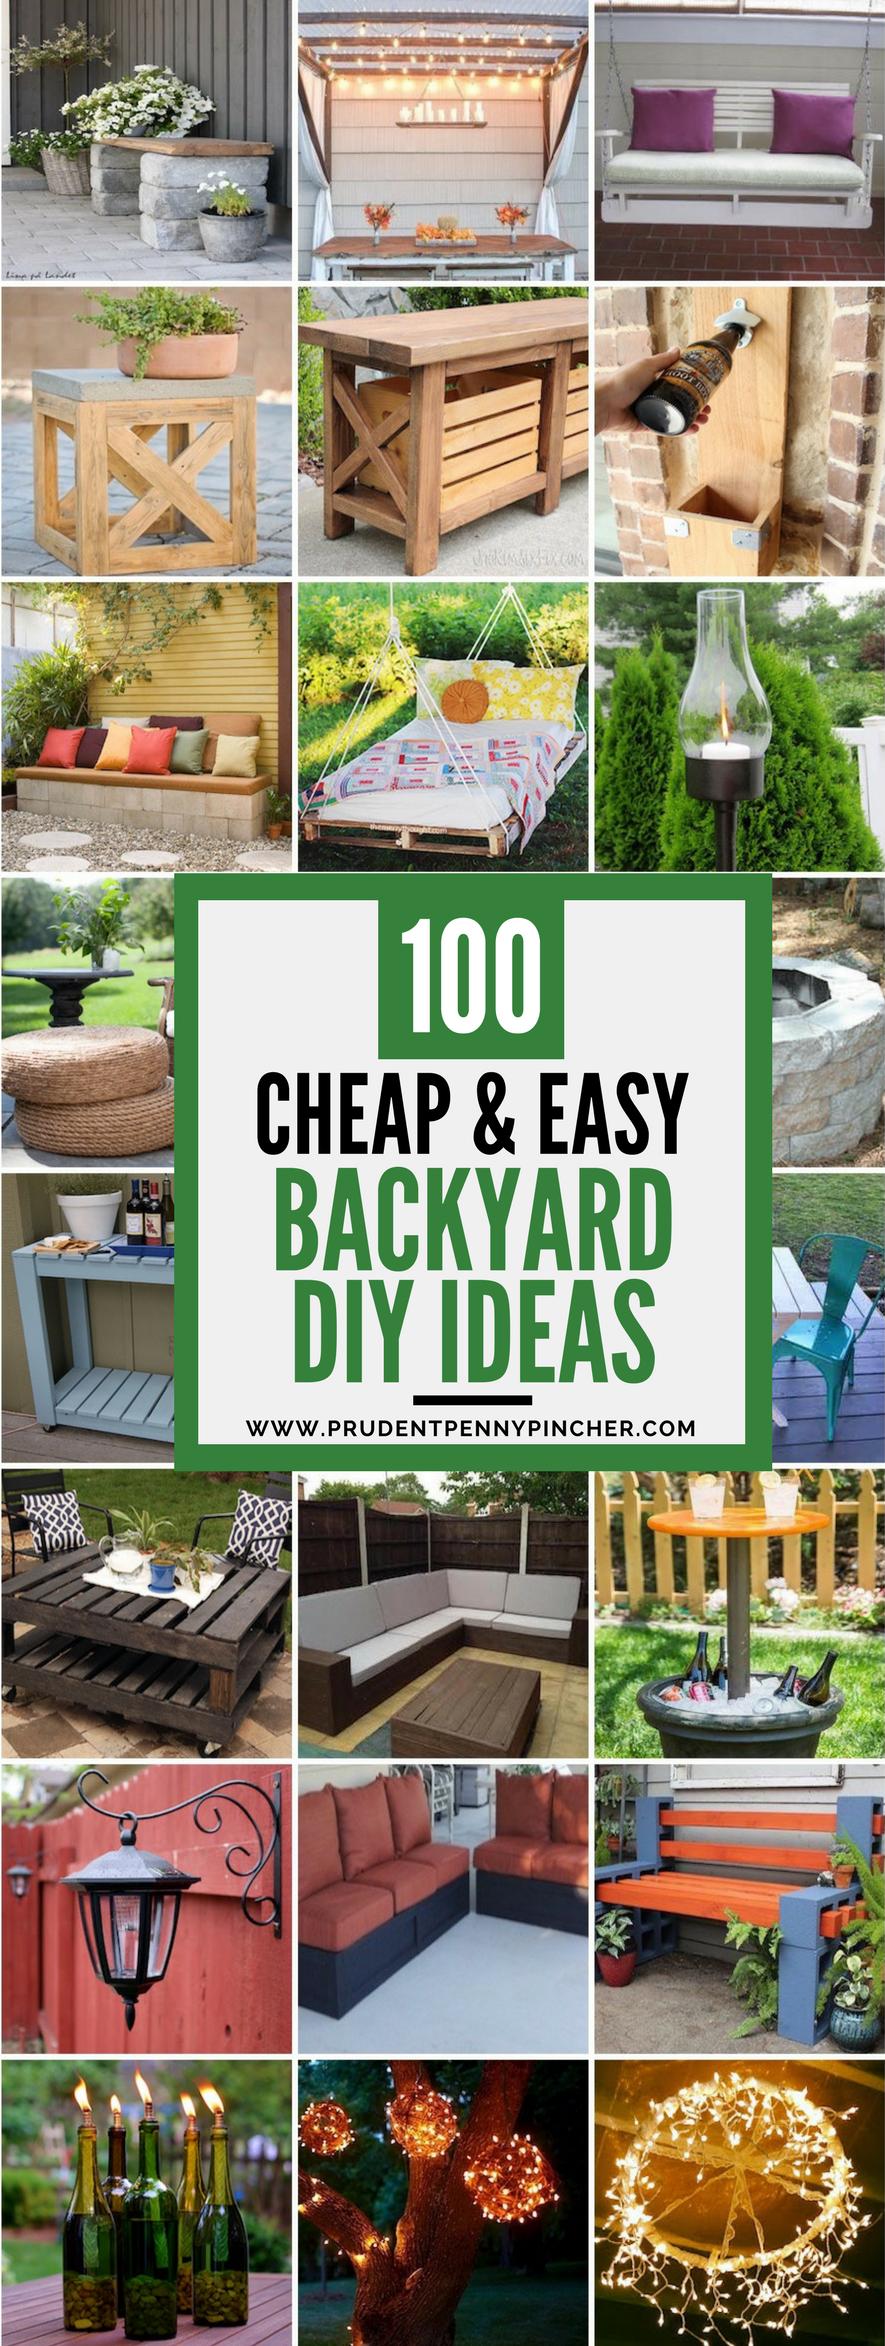 100 Cheap and Easy DIY Backyard Ideas